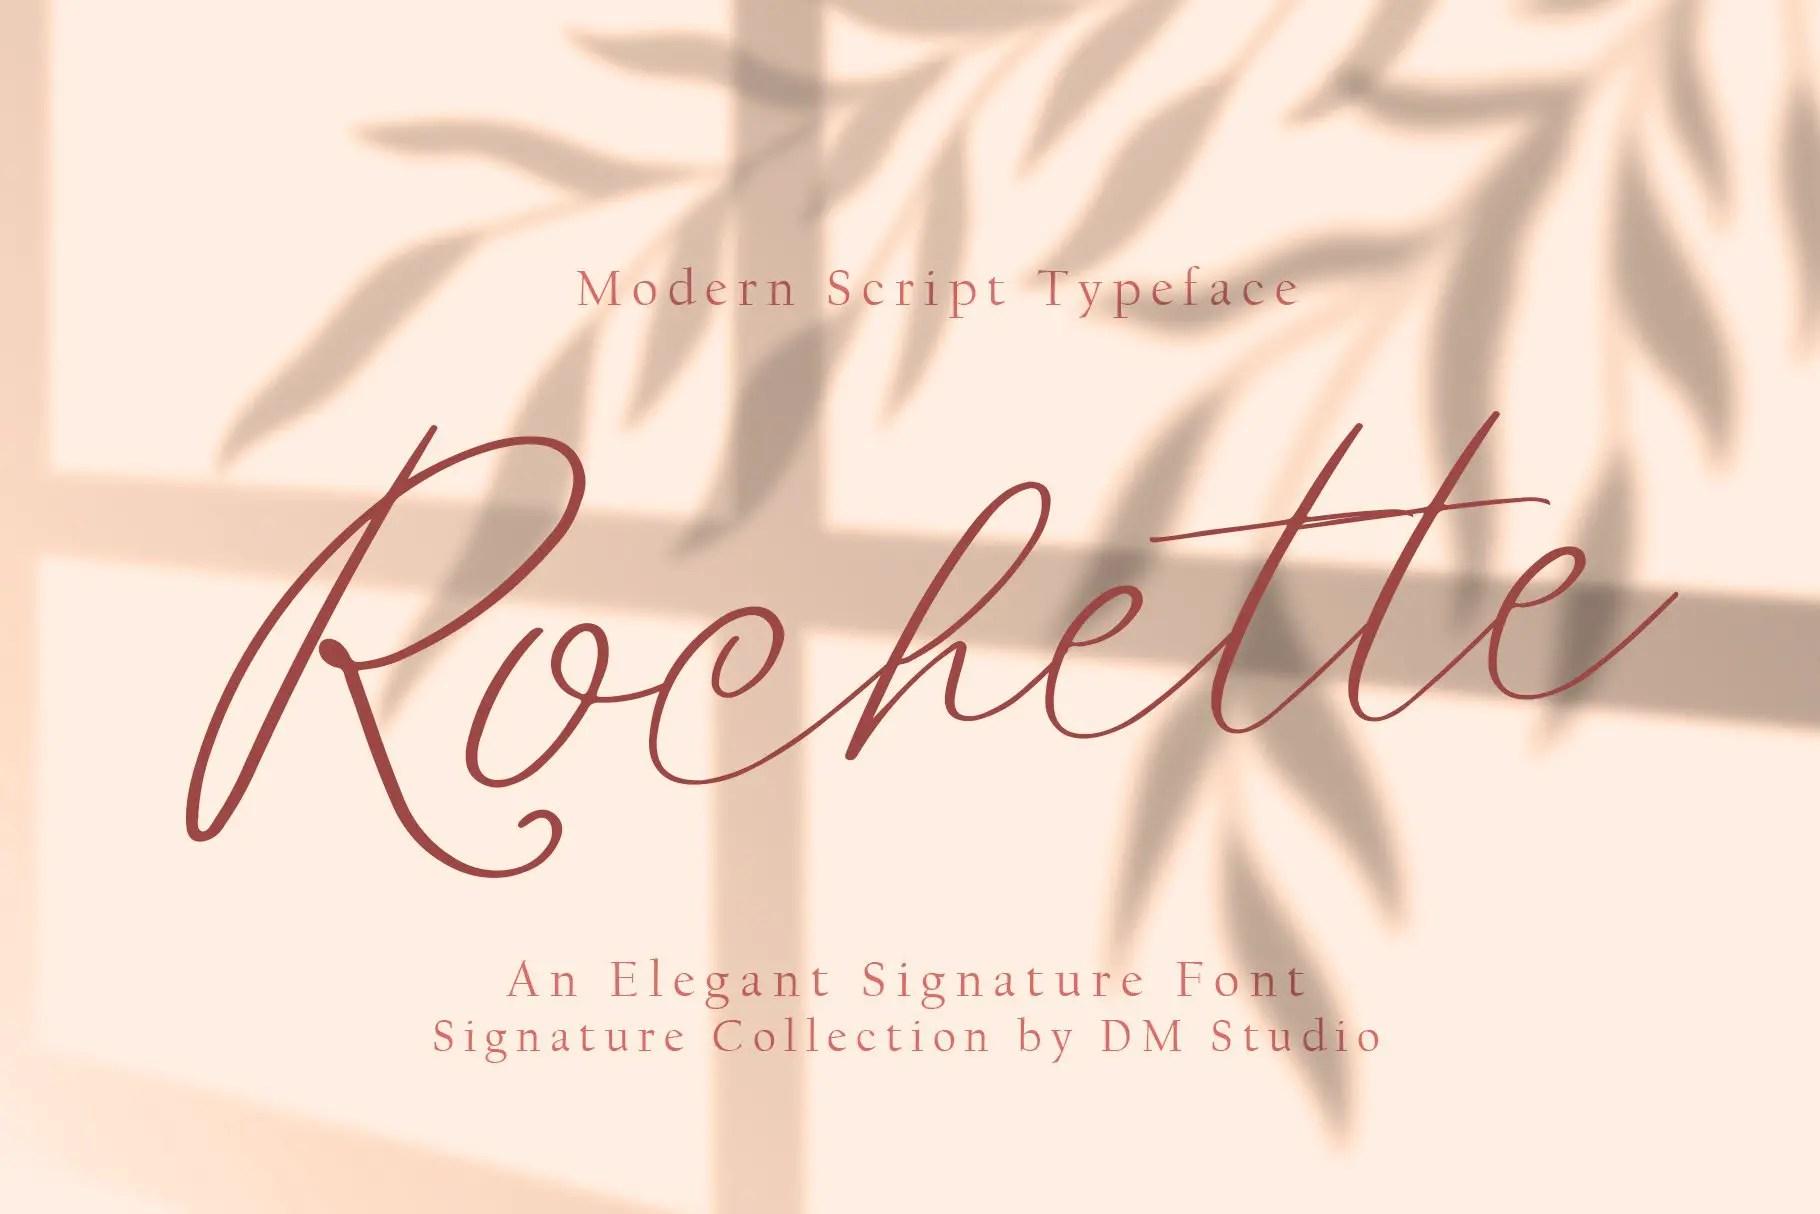 Rochette Elegant Signature Font -1